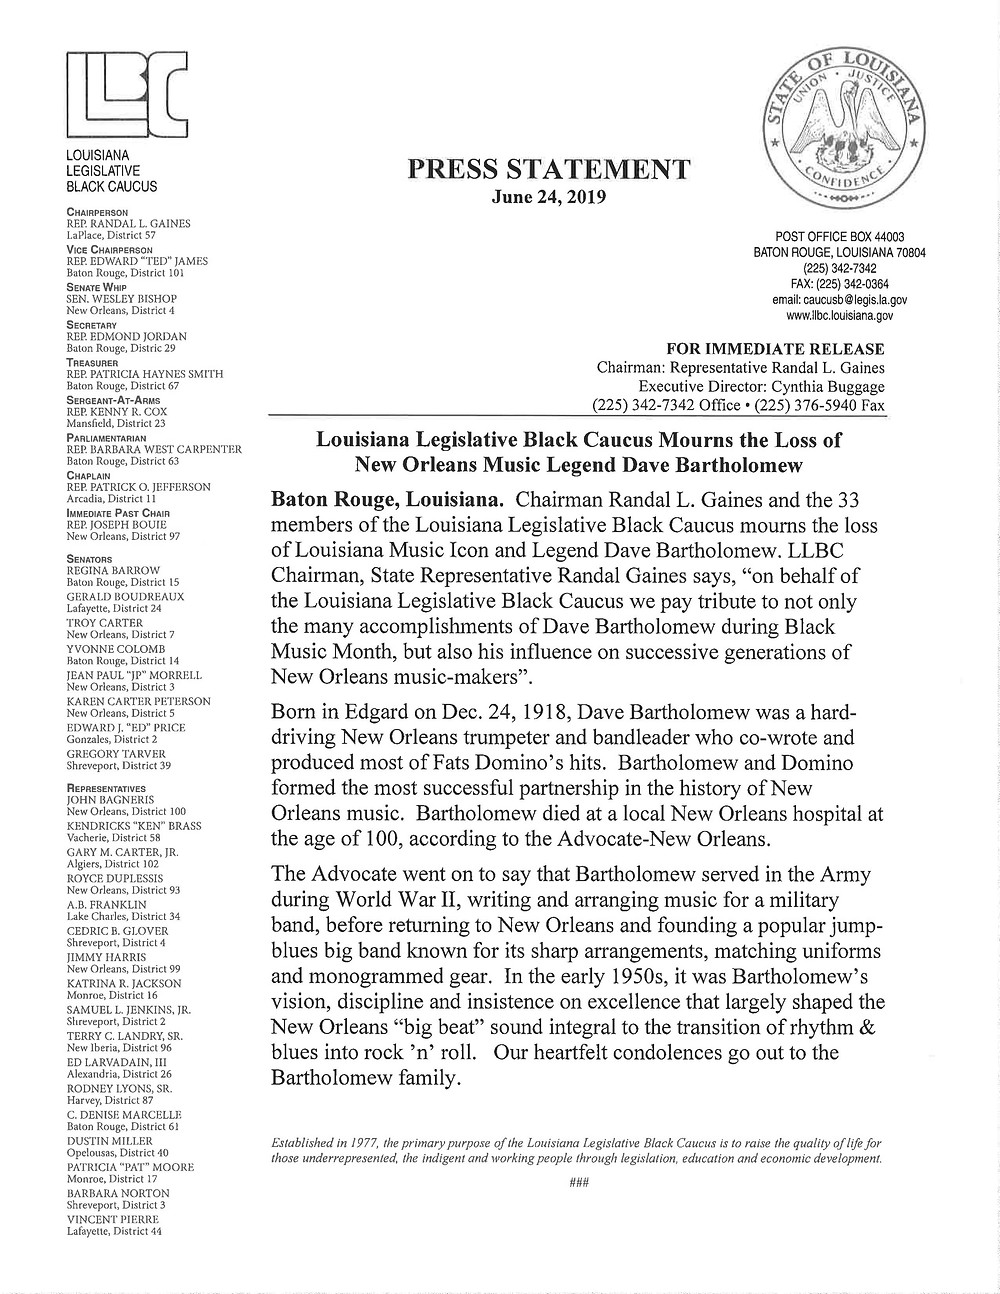 Louisiana Legislative Black Caucus mourns the loss of Louisiana Music Icon and Legend Dave Bartholomew